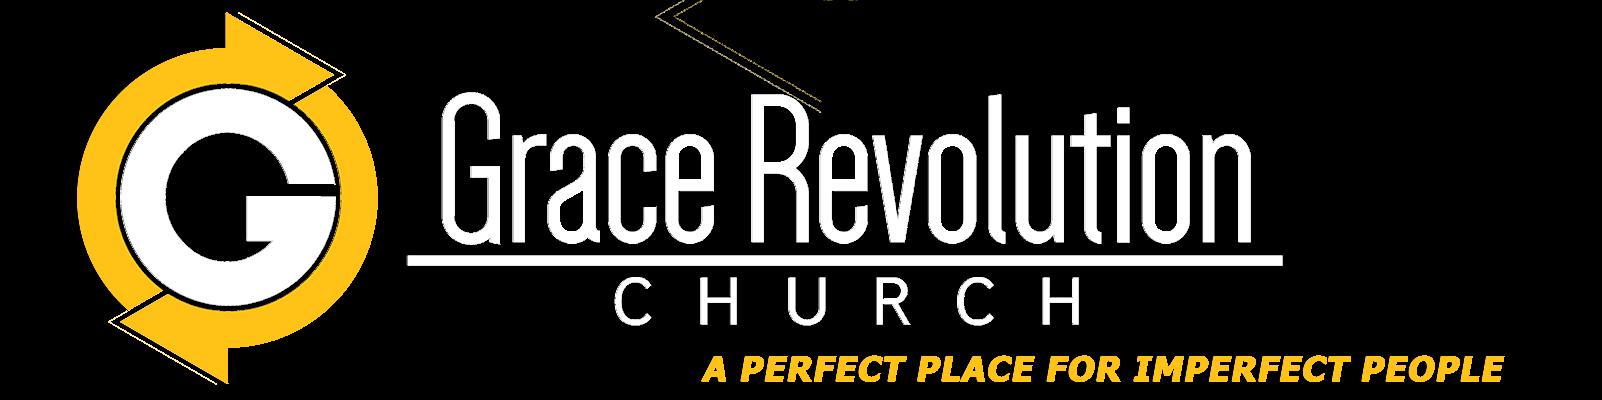 Grace Revolution Church